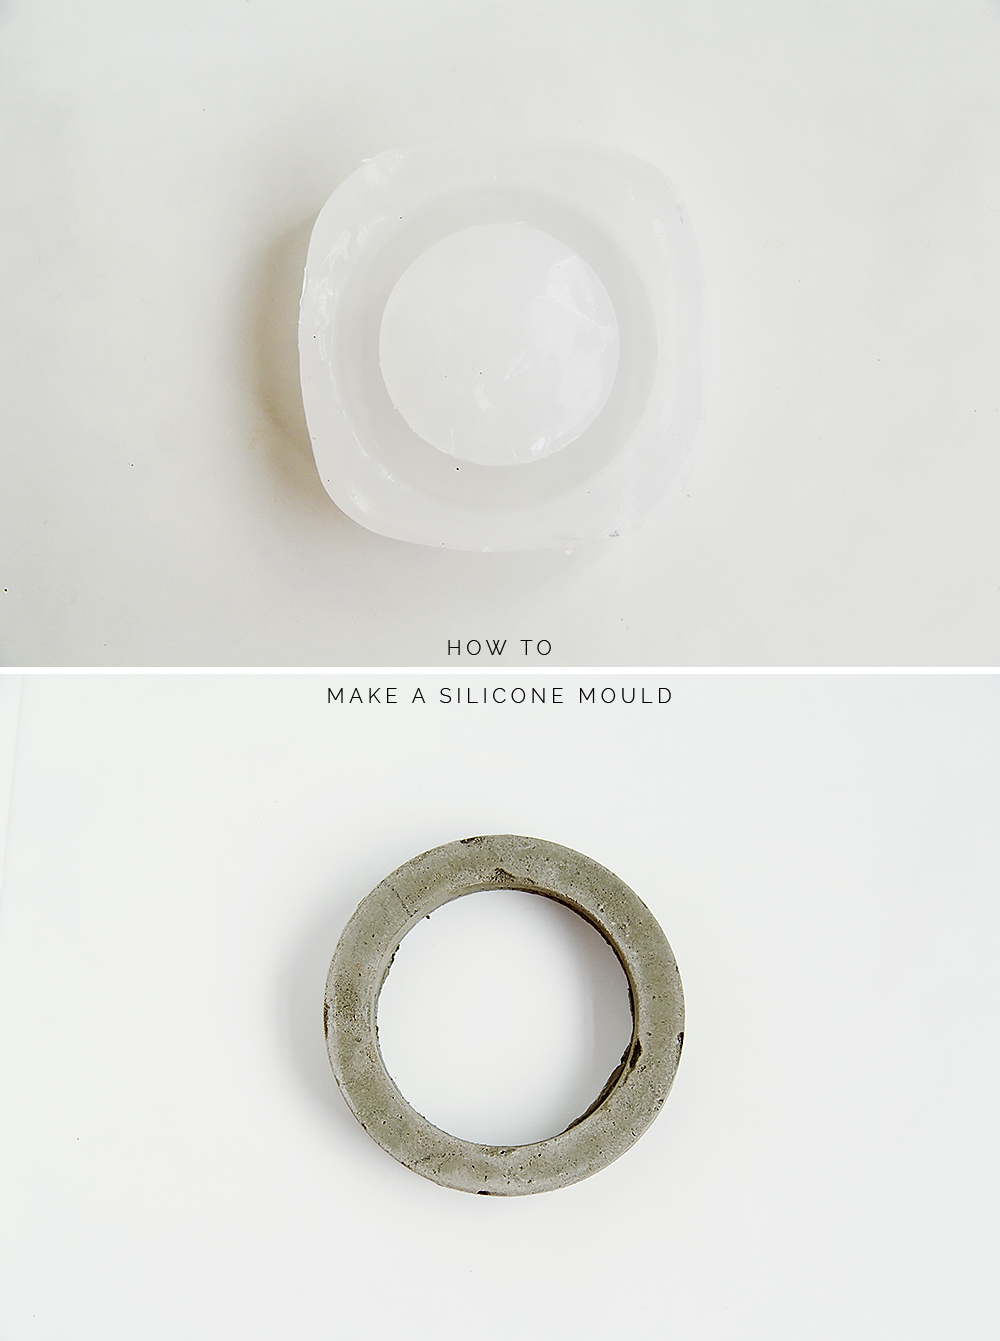 DIY Silicone Mold | @fallfordiy